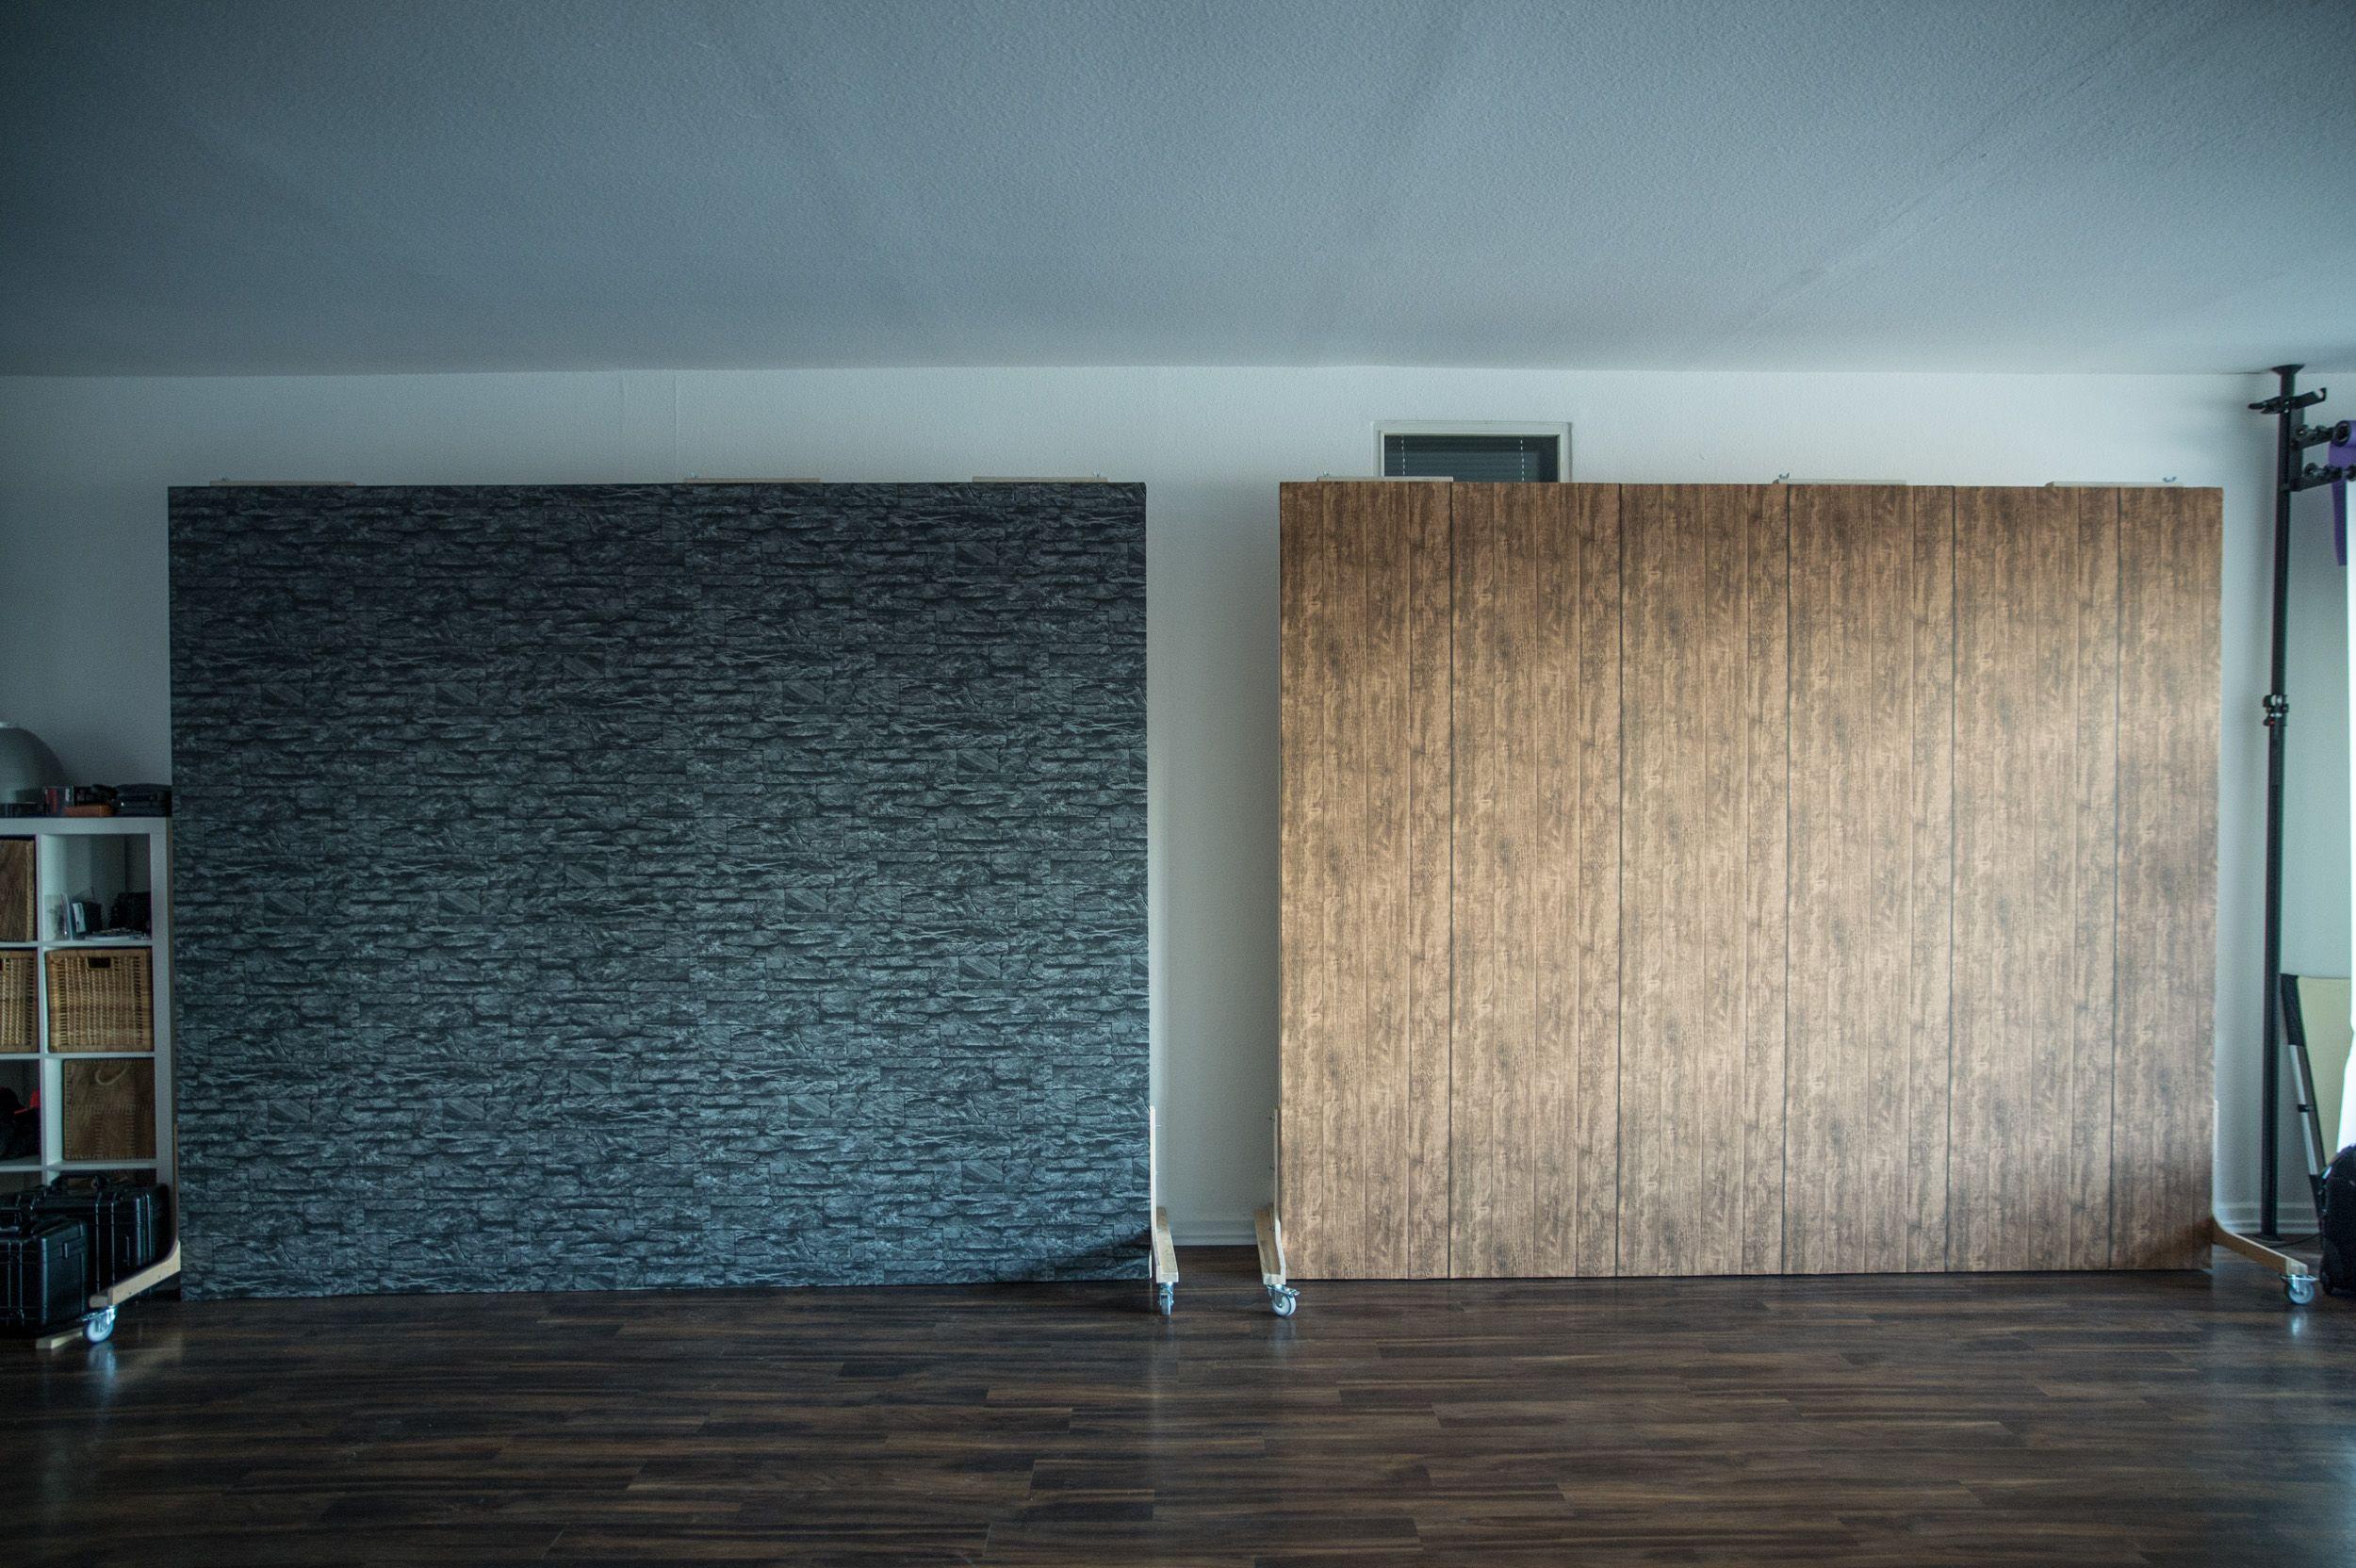 raumtrenner fotohinterg nde regale pinterest raumtrenner fotostudio und studio. Black Bedroom Furniture Sets. Home Design Ideas